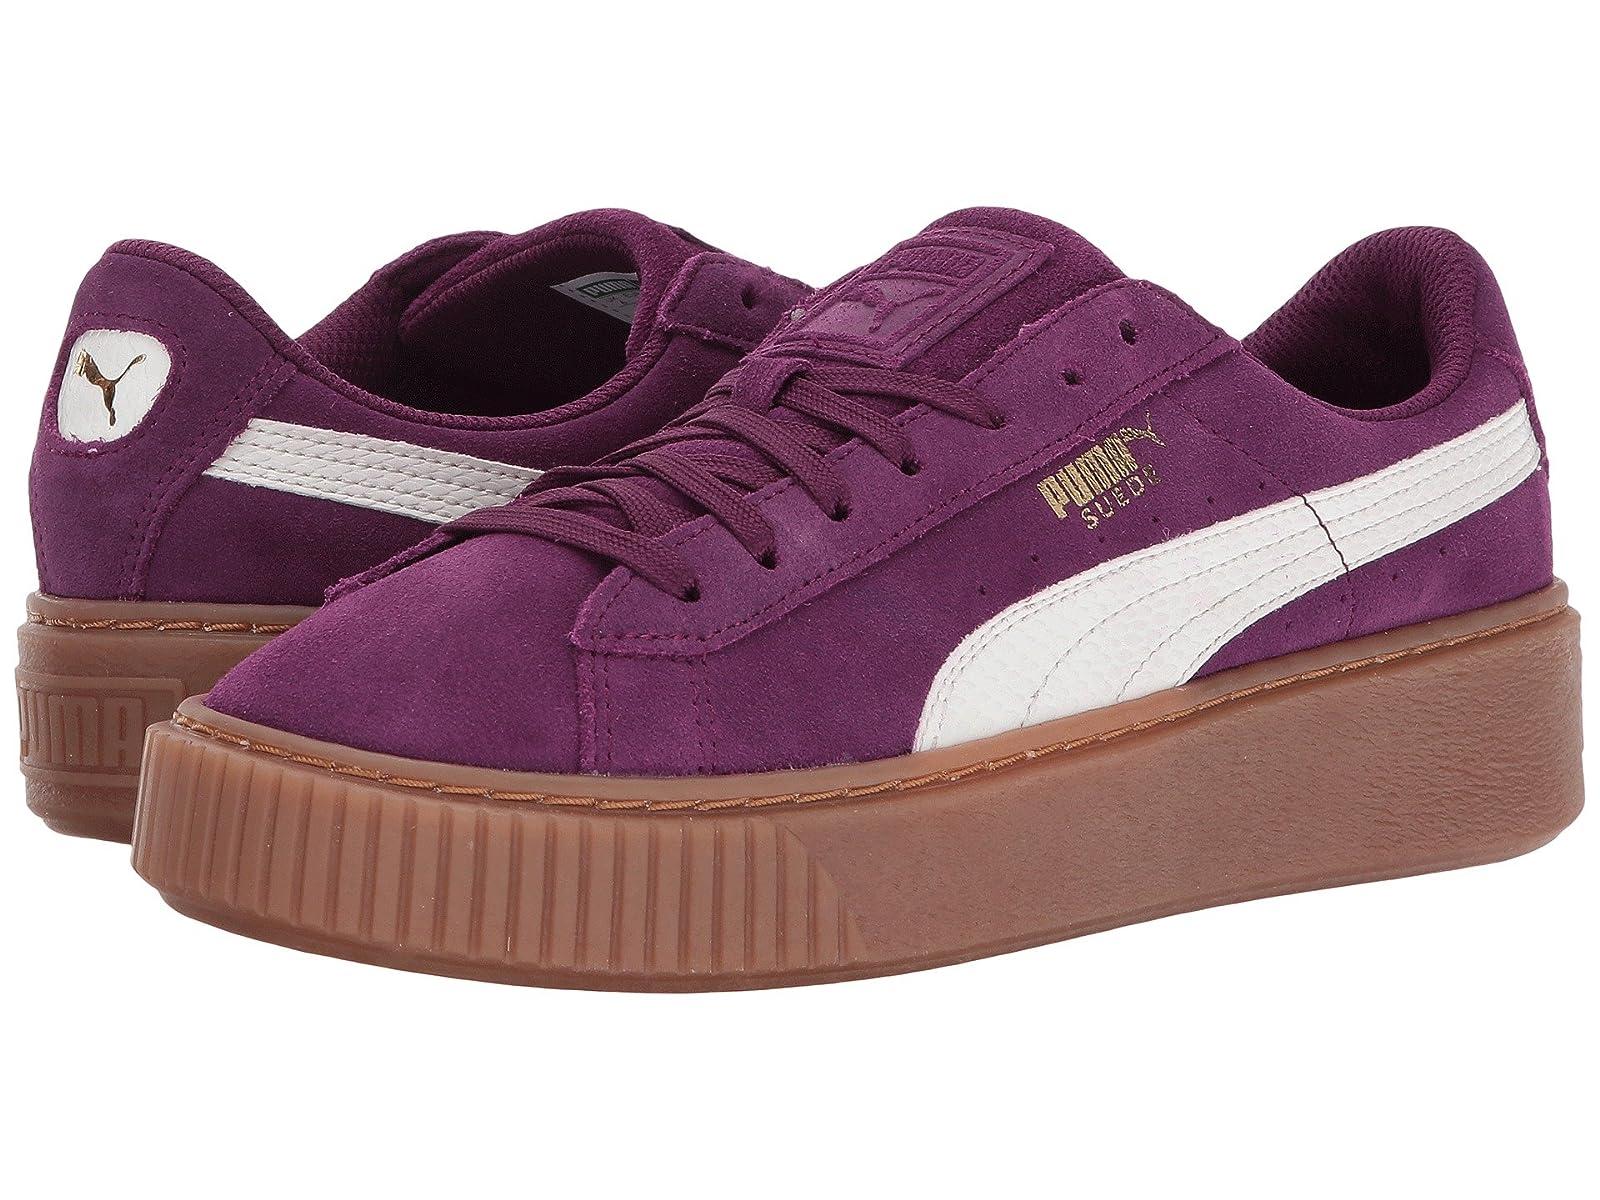 Puma Kids Suede Platform SNK (Big Kid)Cheap and distinctive eye-catching shoes